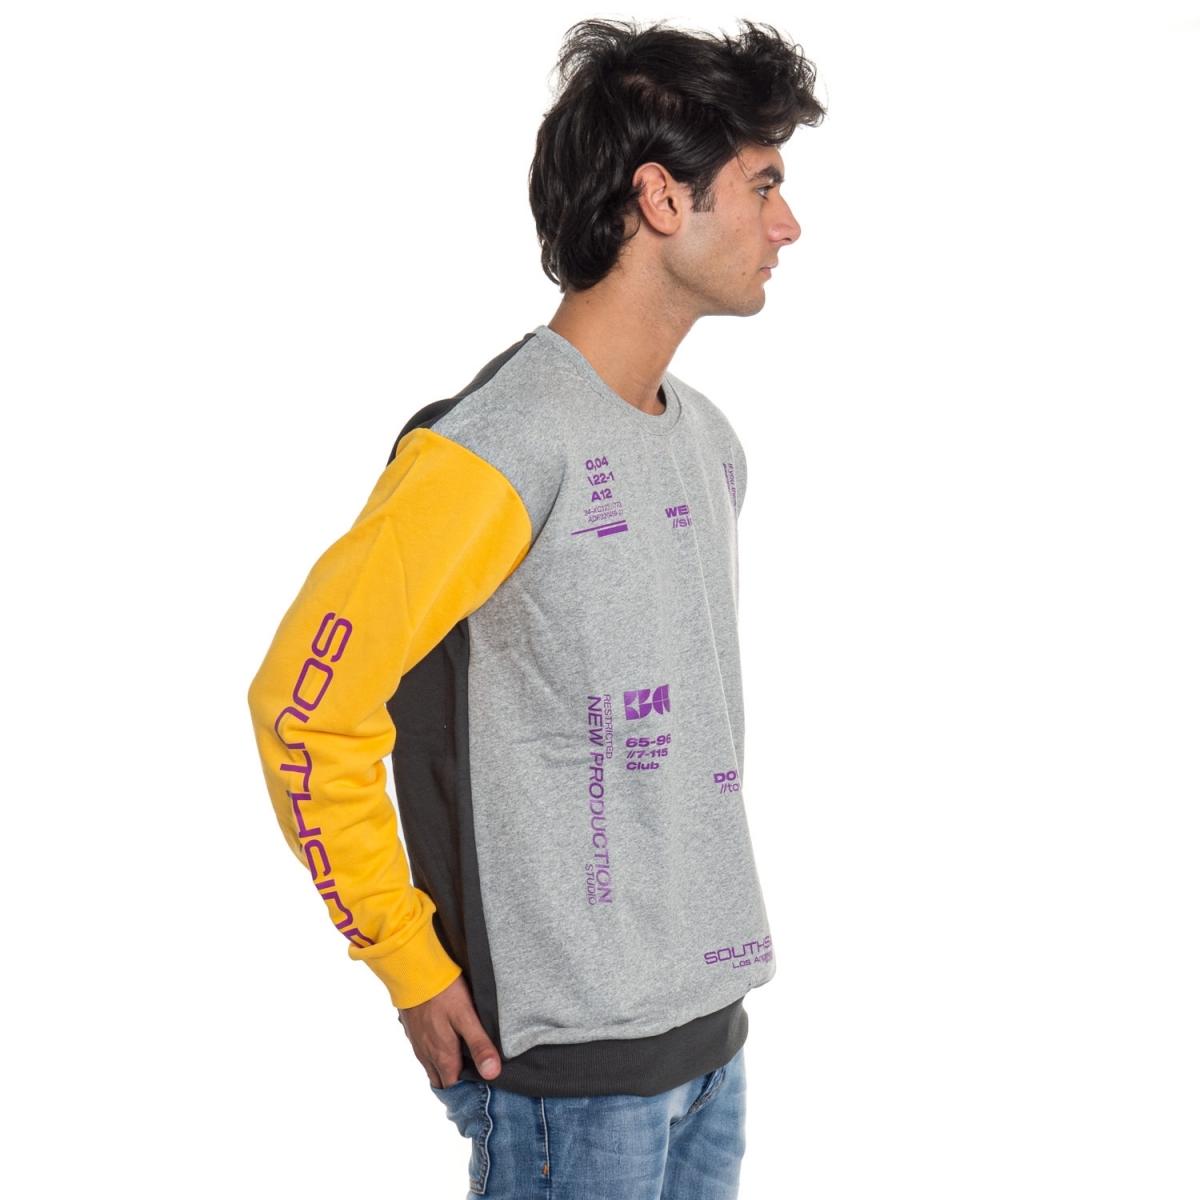 clothing Sweatshirts men Felpa SX1-22ST SOUTHSIDE Cafedelmar Shop